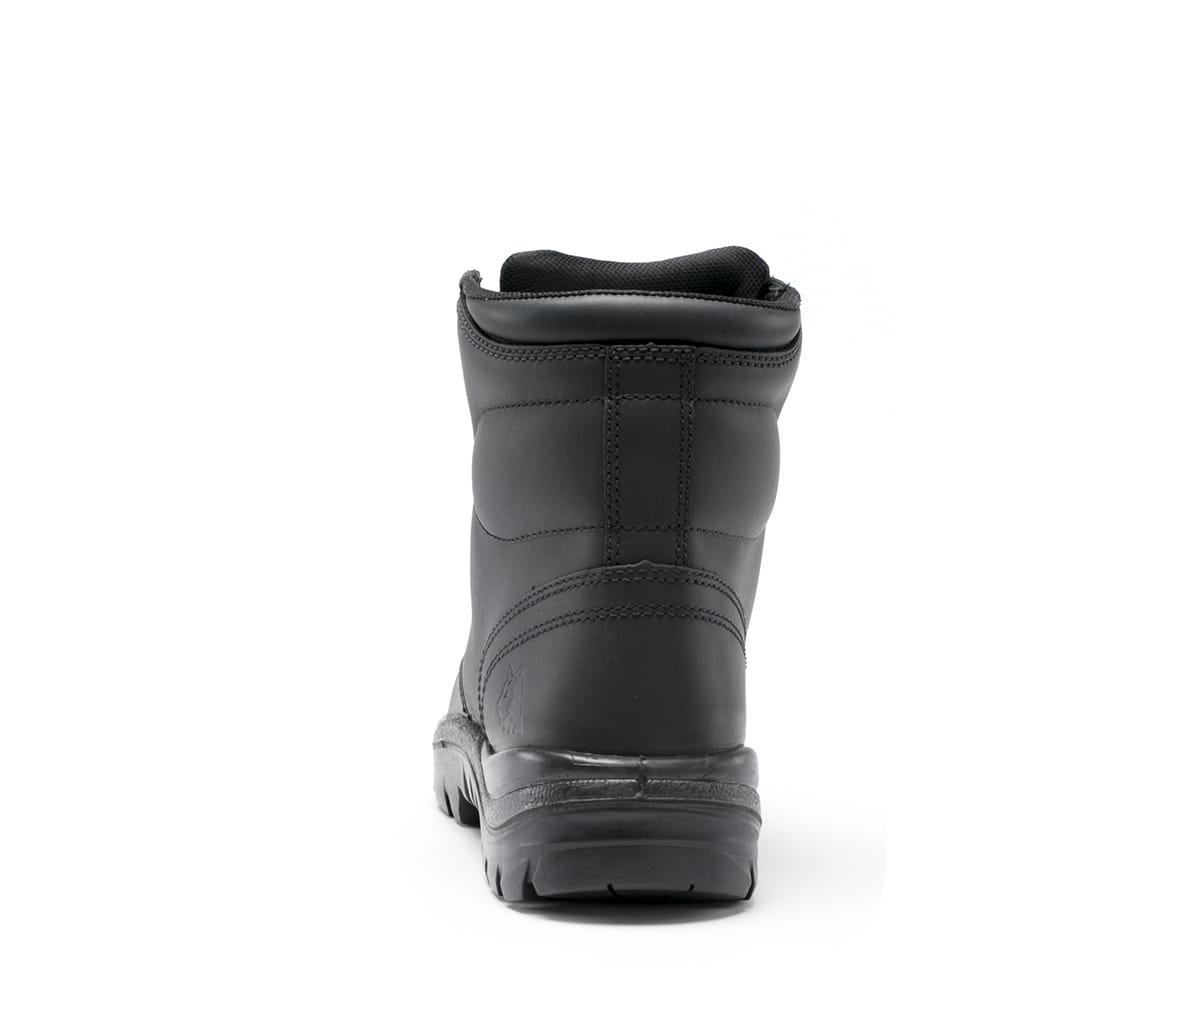 Argyle®: Nitrile/Bump Cap/PR Midsole - Black